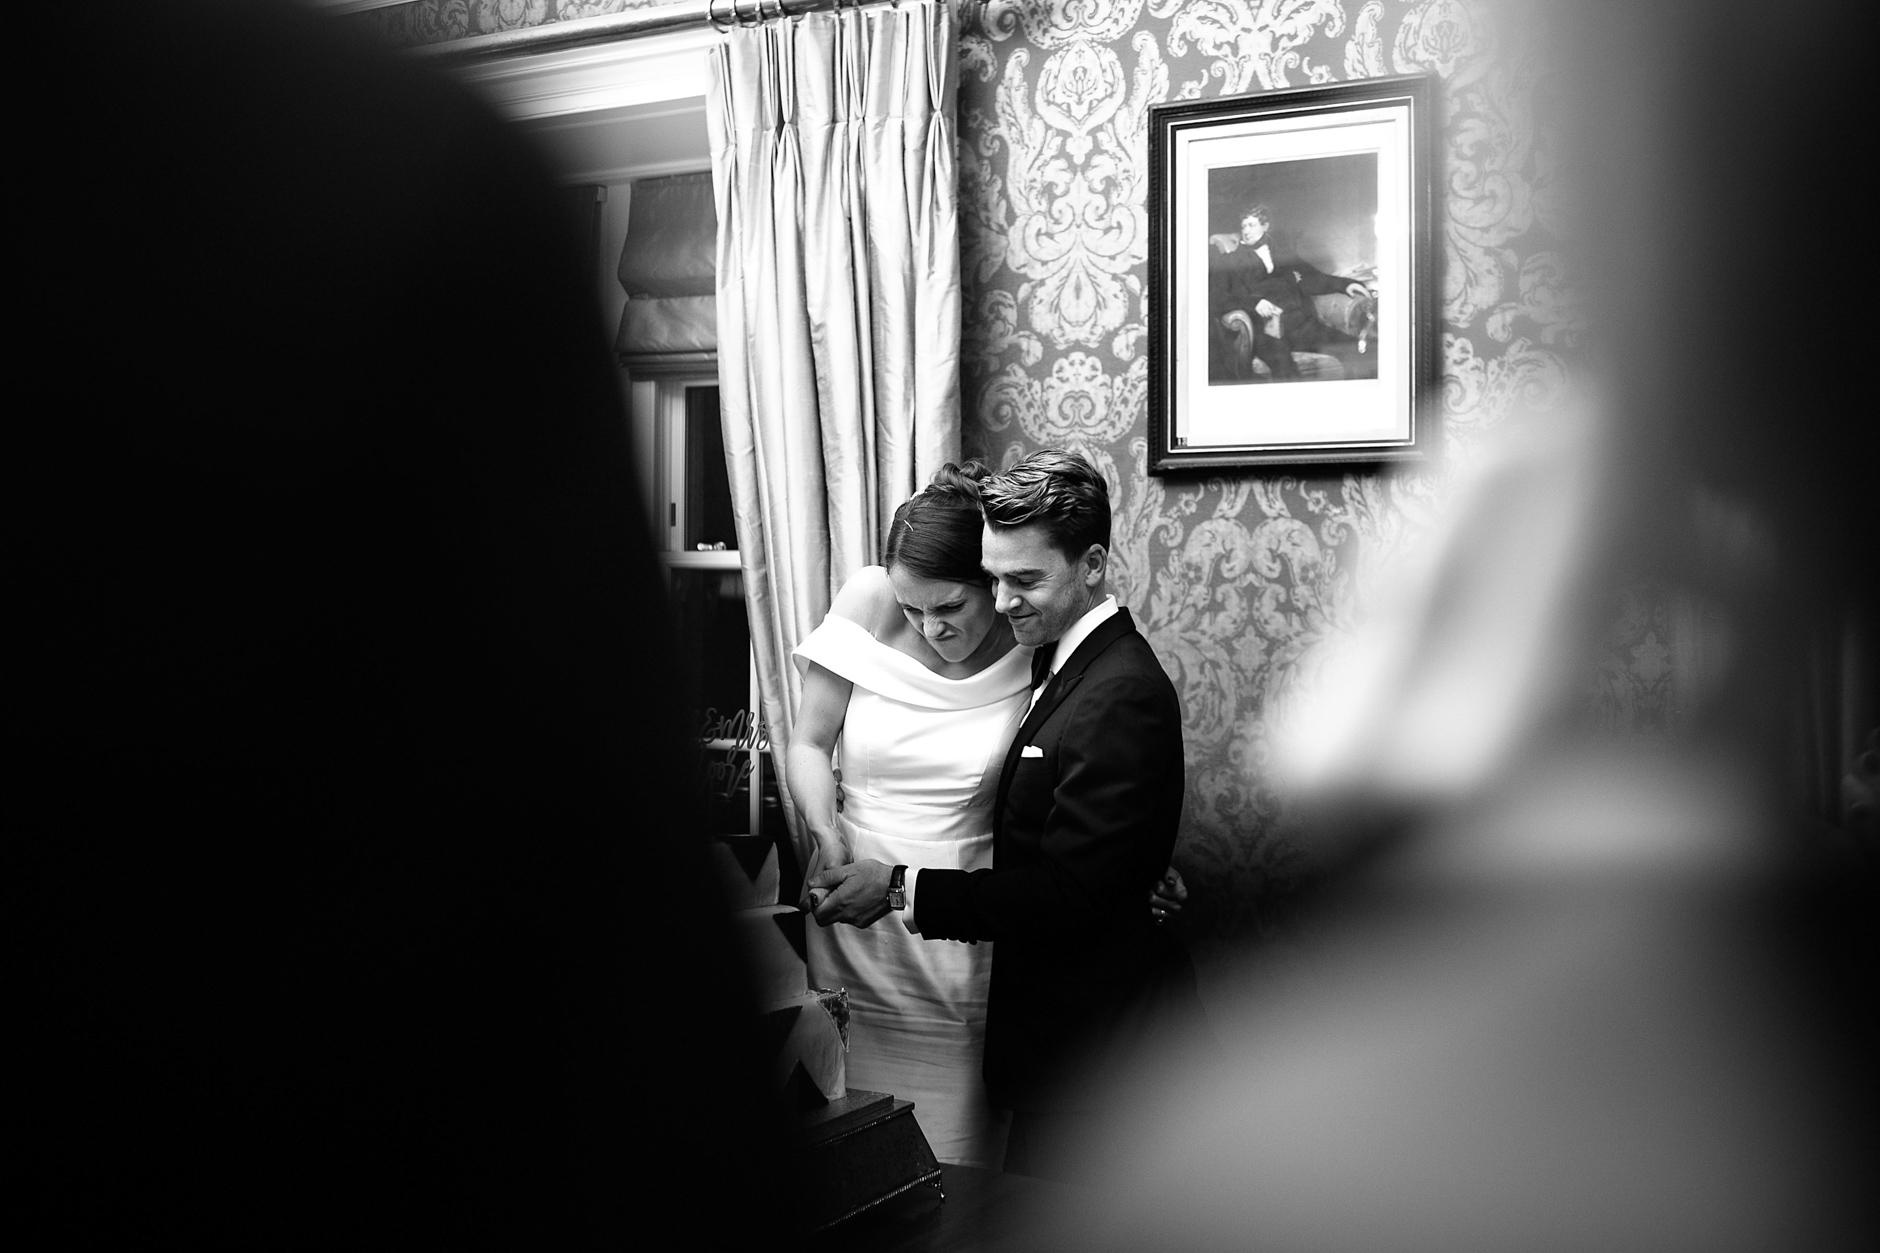 Glentruim-Wedding-Nikki-Leadbetter-Photography-339.jpg